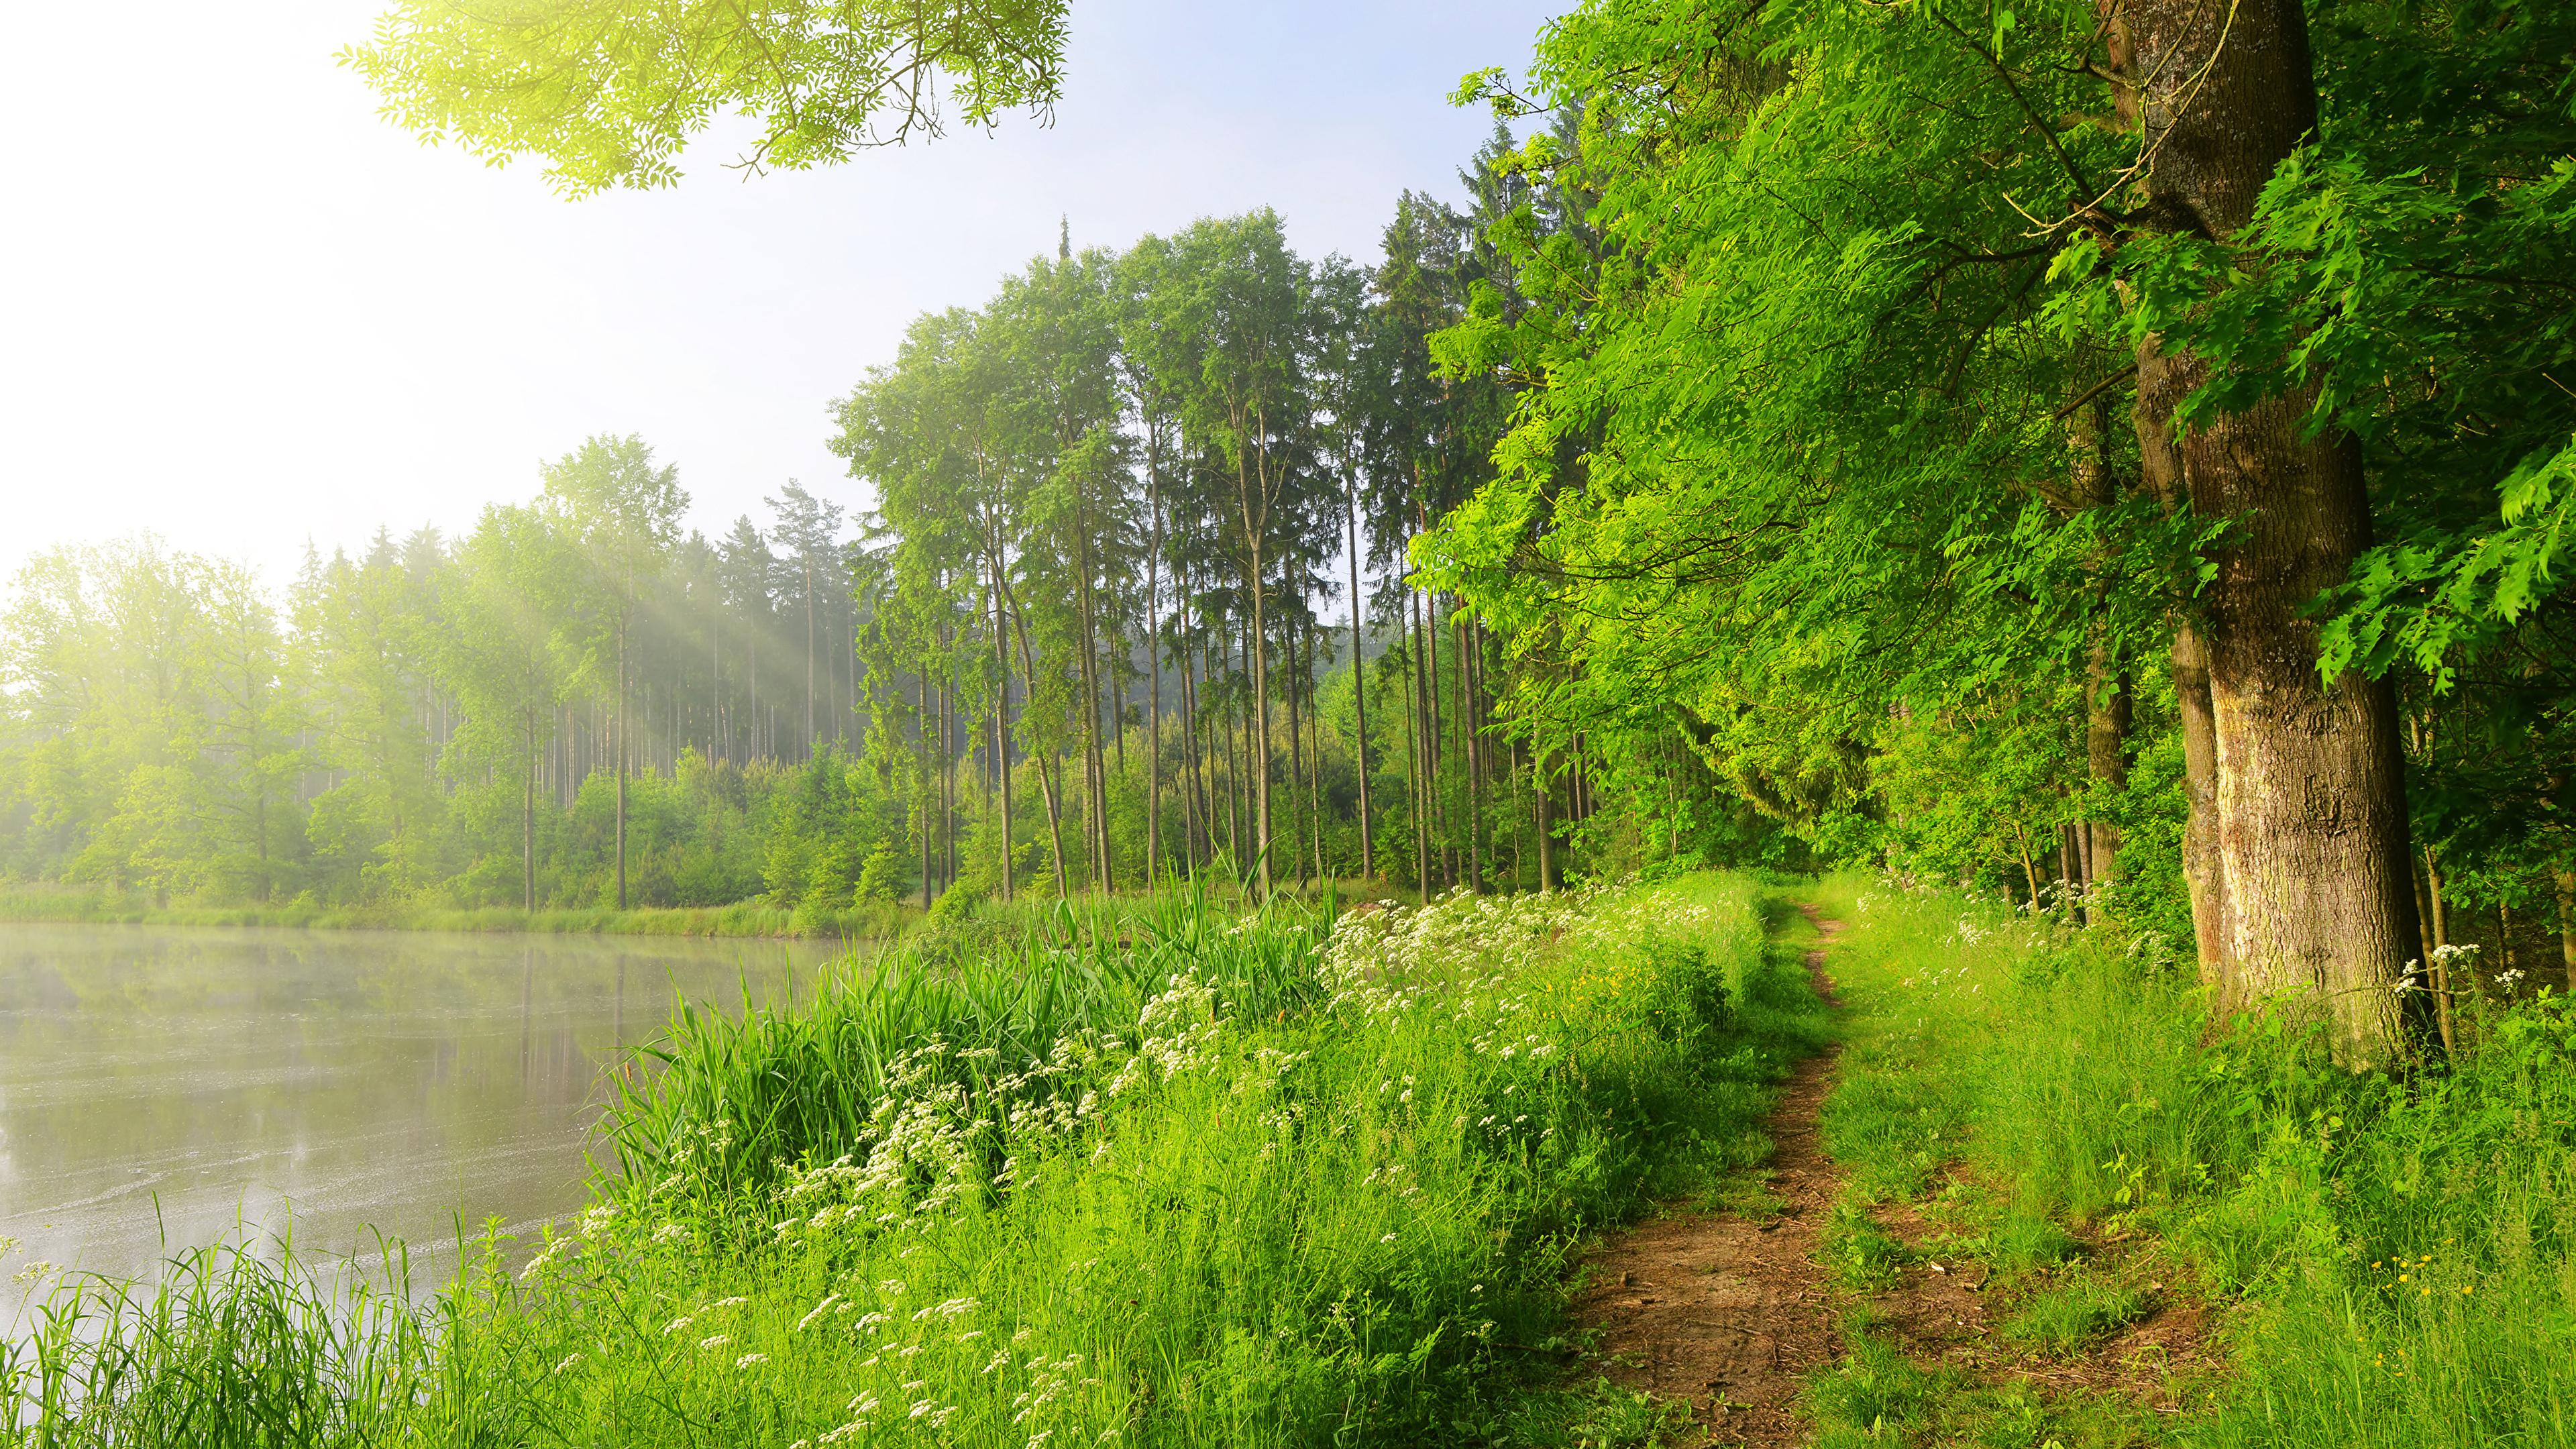 озеро зелень деревья лето the lake greens trees summer без смс